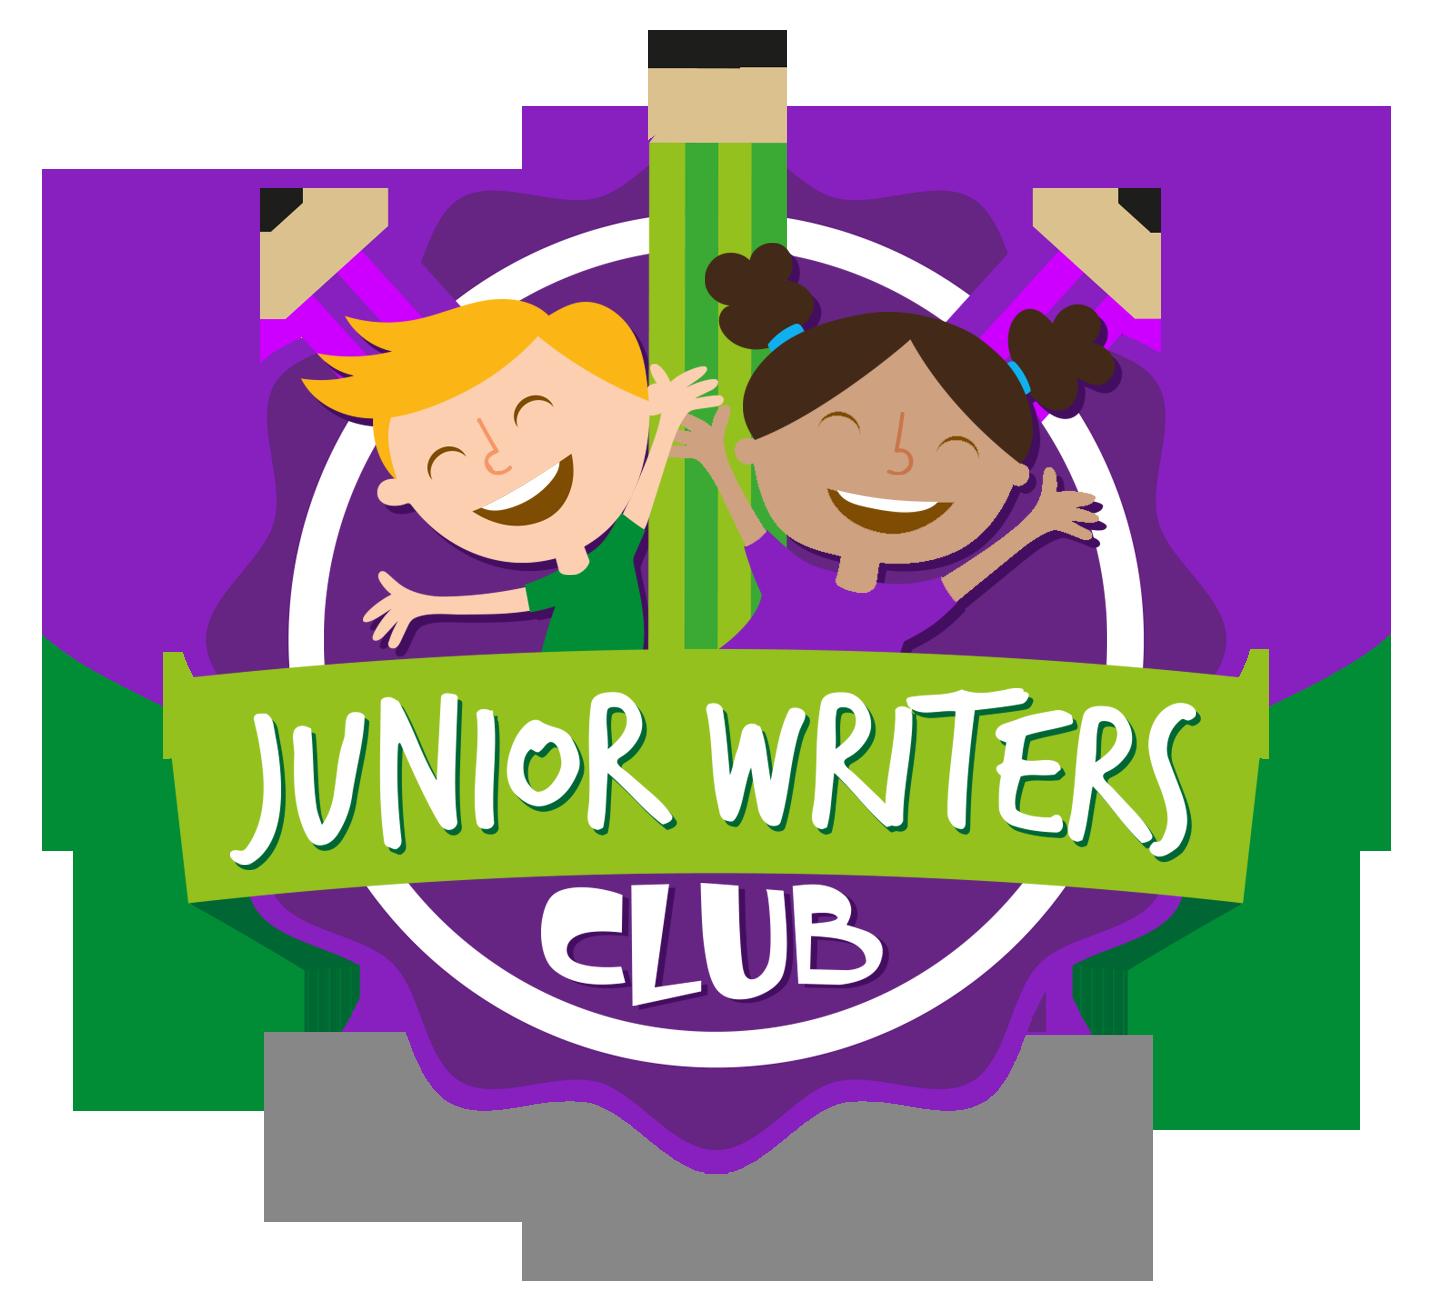 Writer clipart writing club. Home junior writers